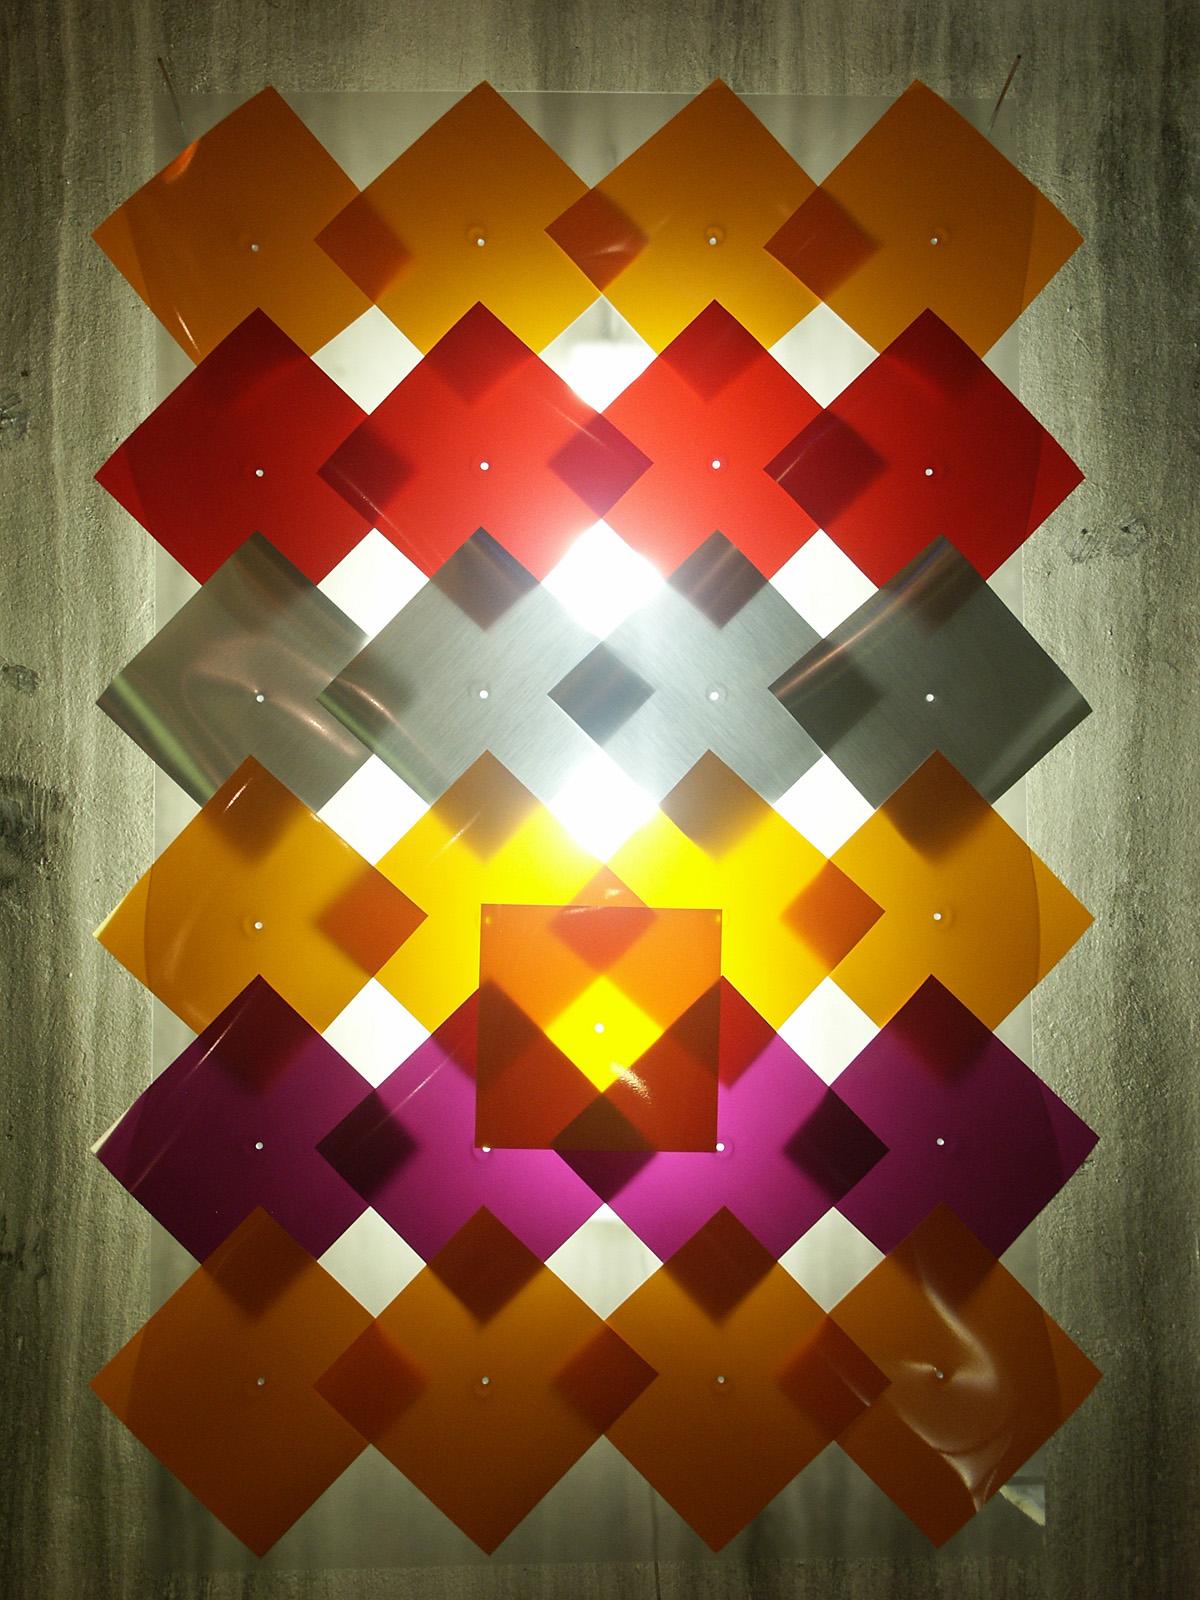 Freydenberg_Trans_Square_6.jpg